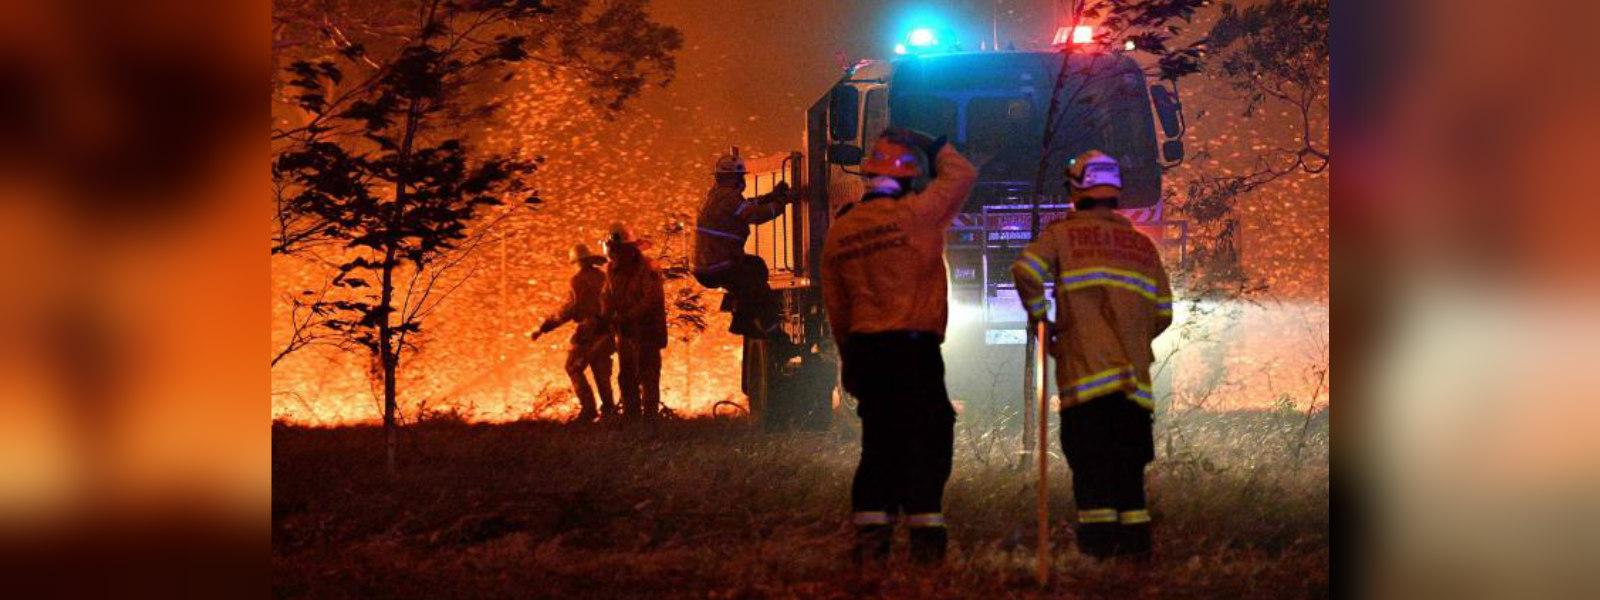 Australia fires: NSW declares week-long state of emergency